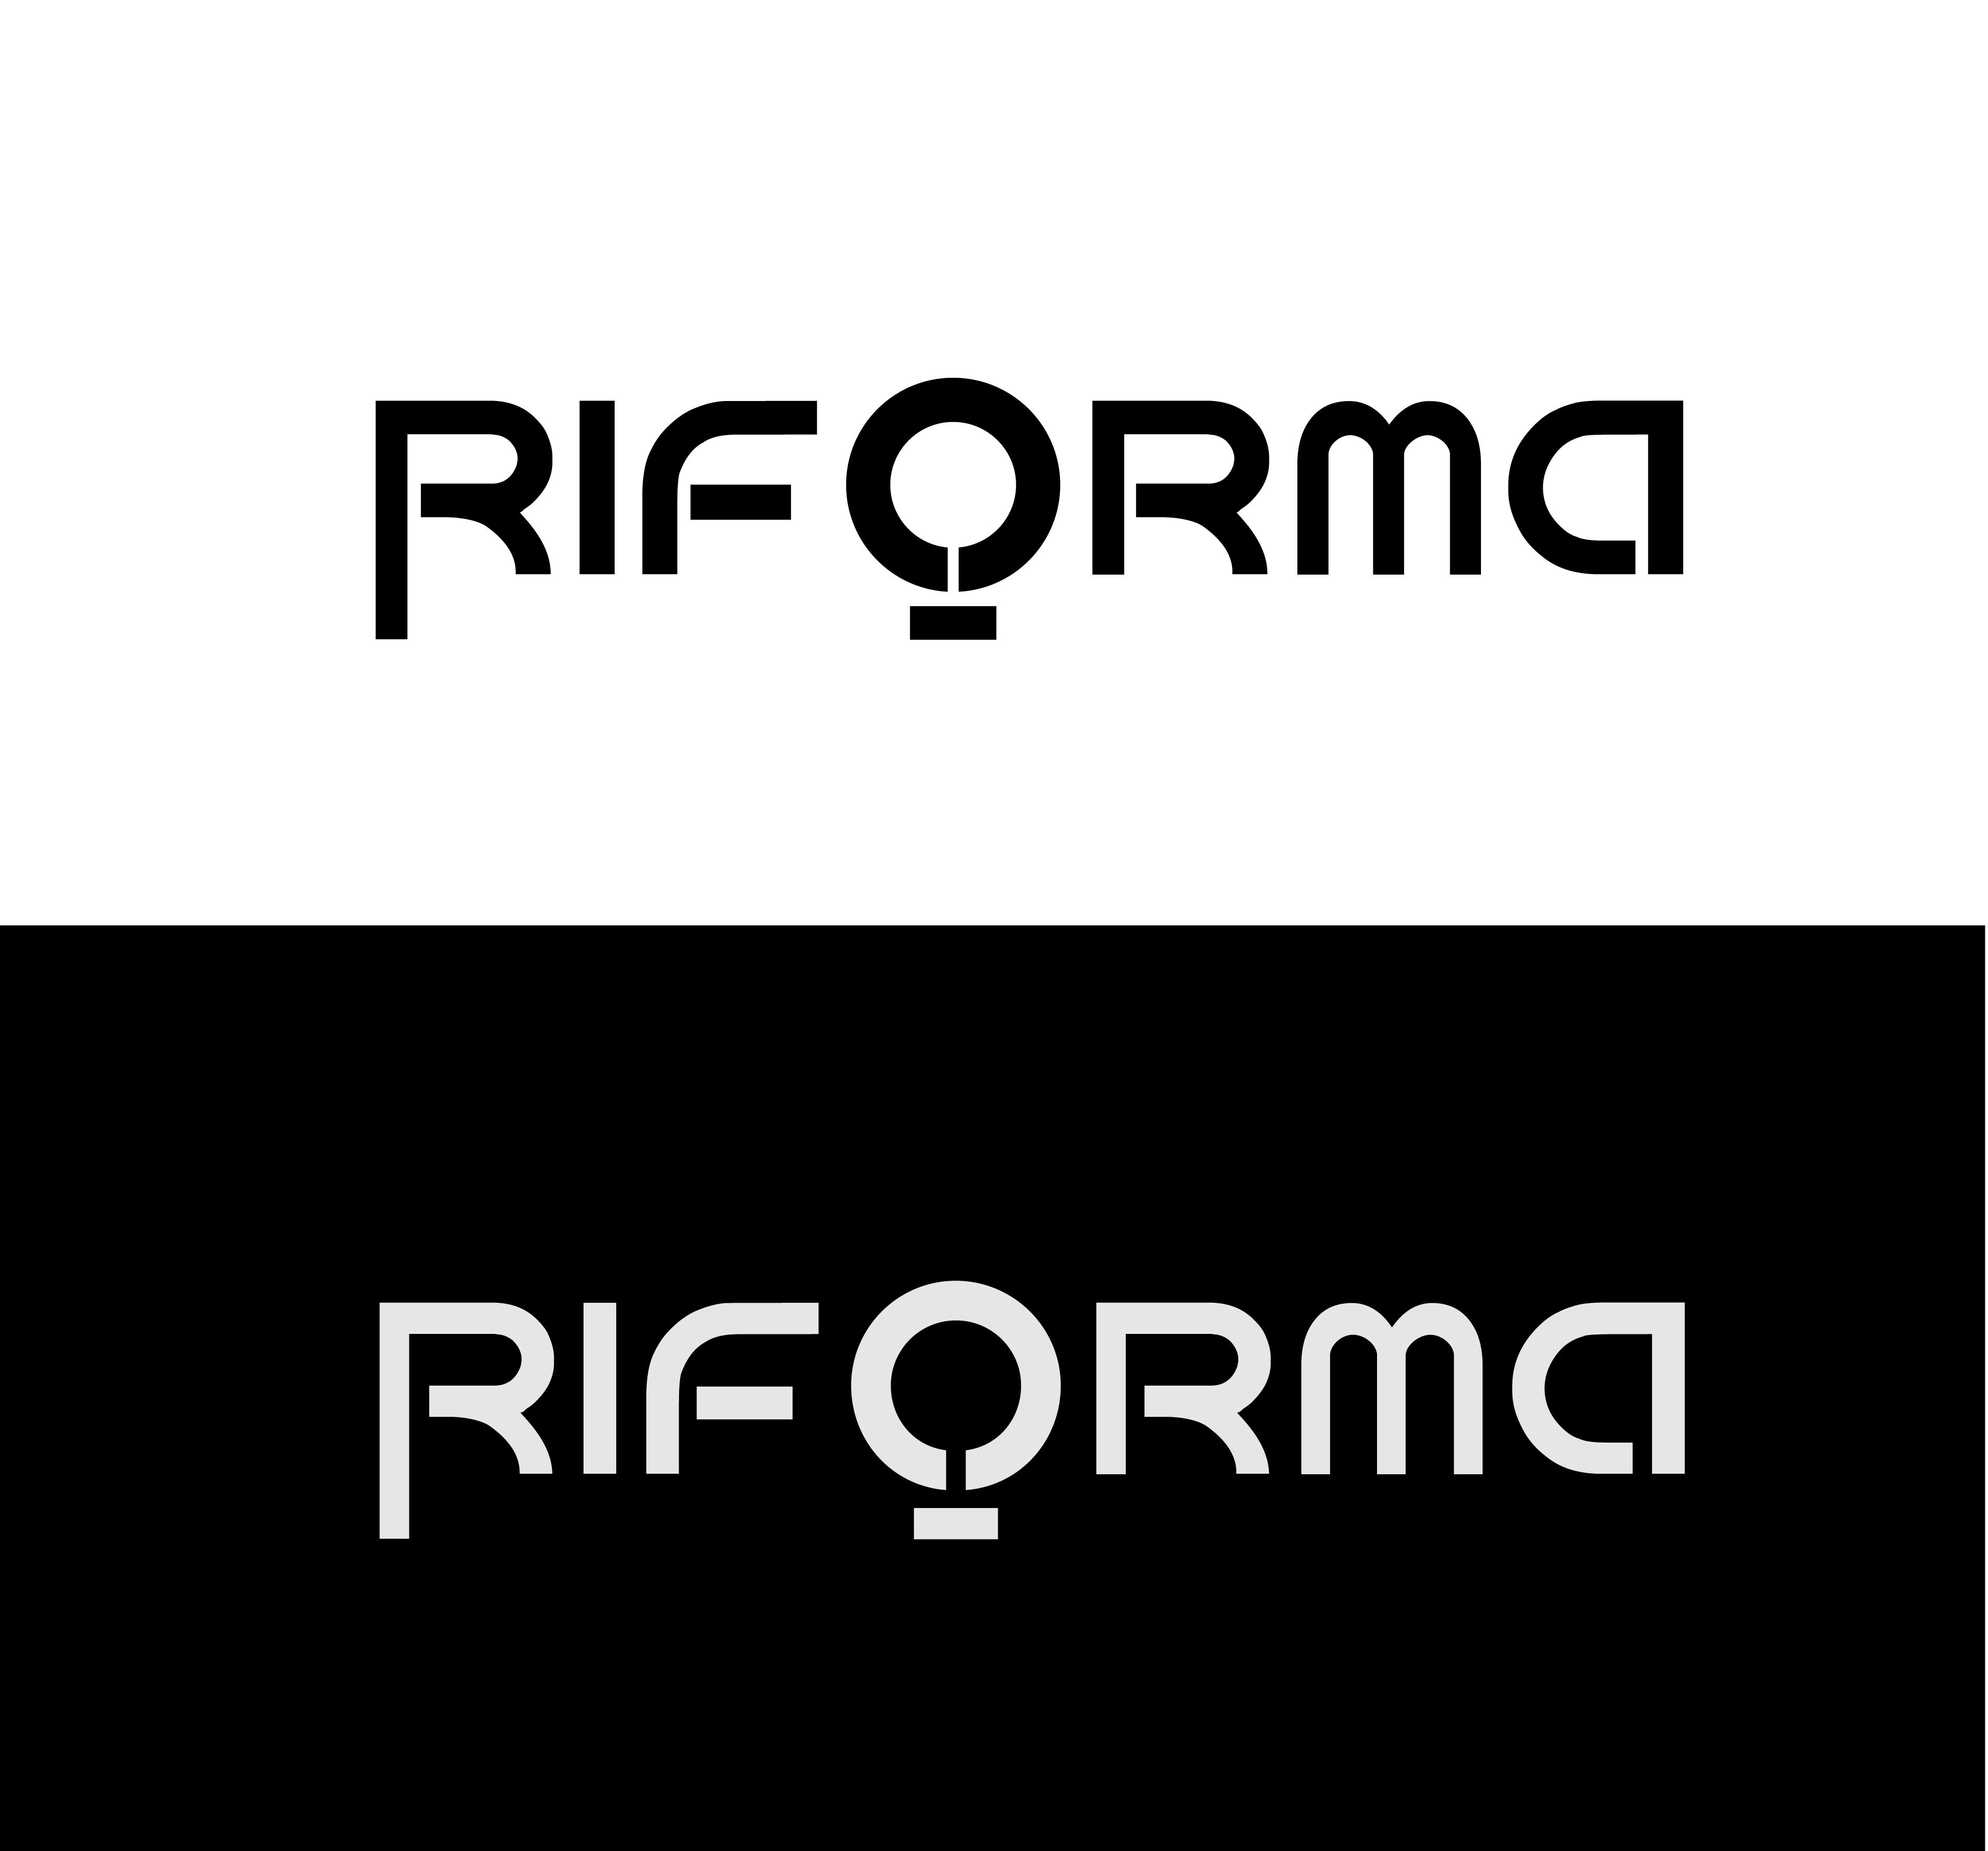 Разработка логотипа и элементов фирменного стиля фото f_74157ab1d3886453.jpg